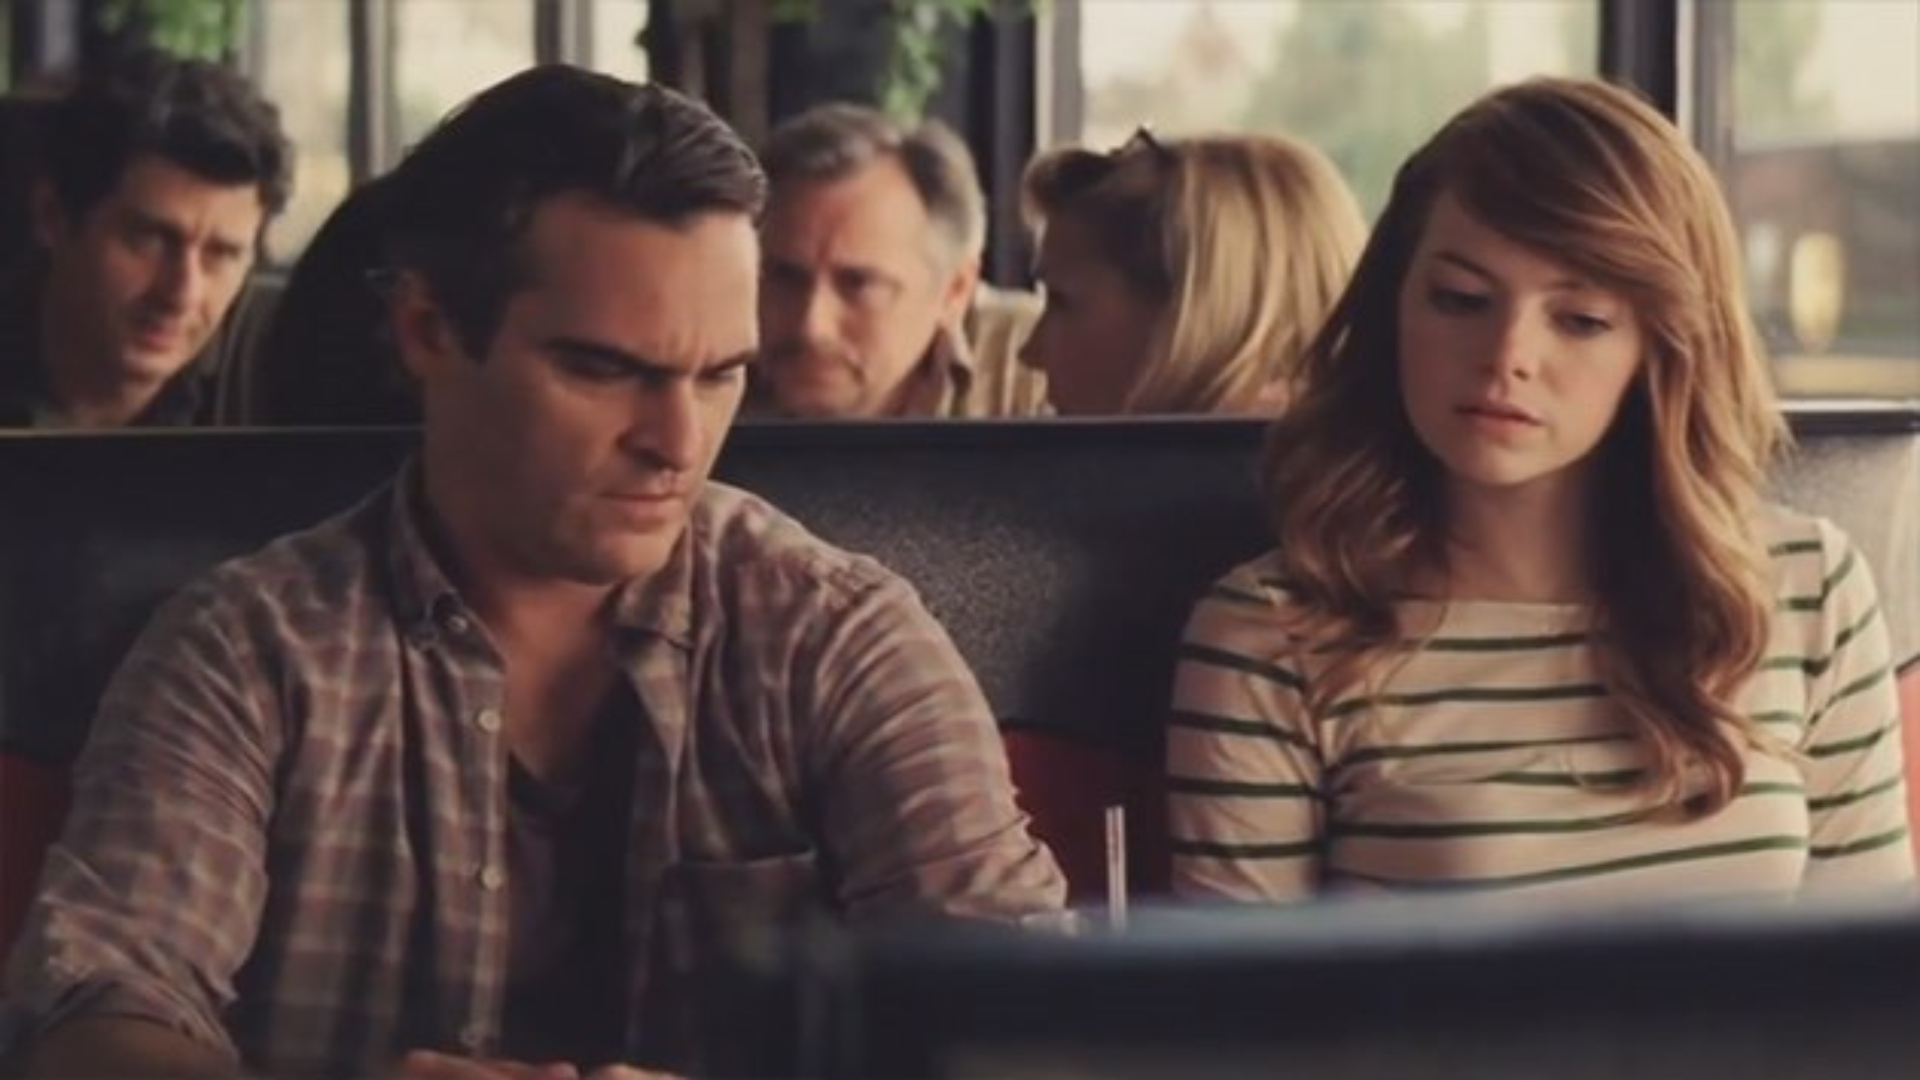 Emma-Stone-Joaquin-Phoenix-Irrational-Man